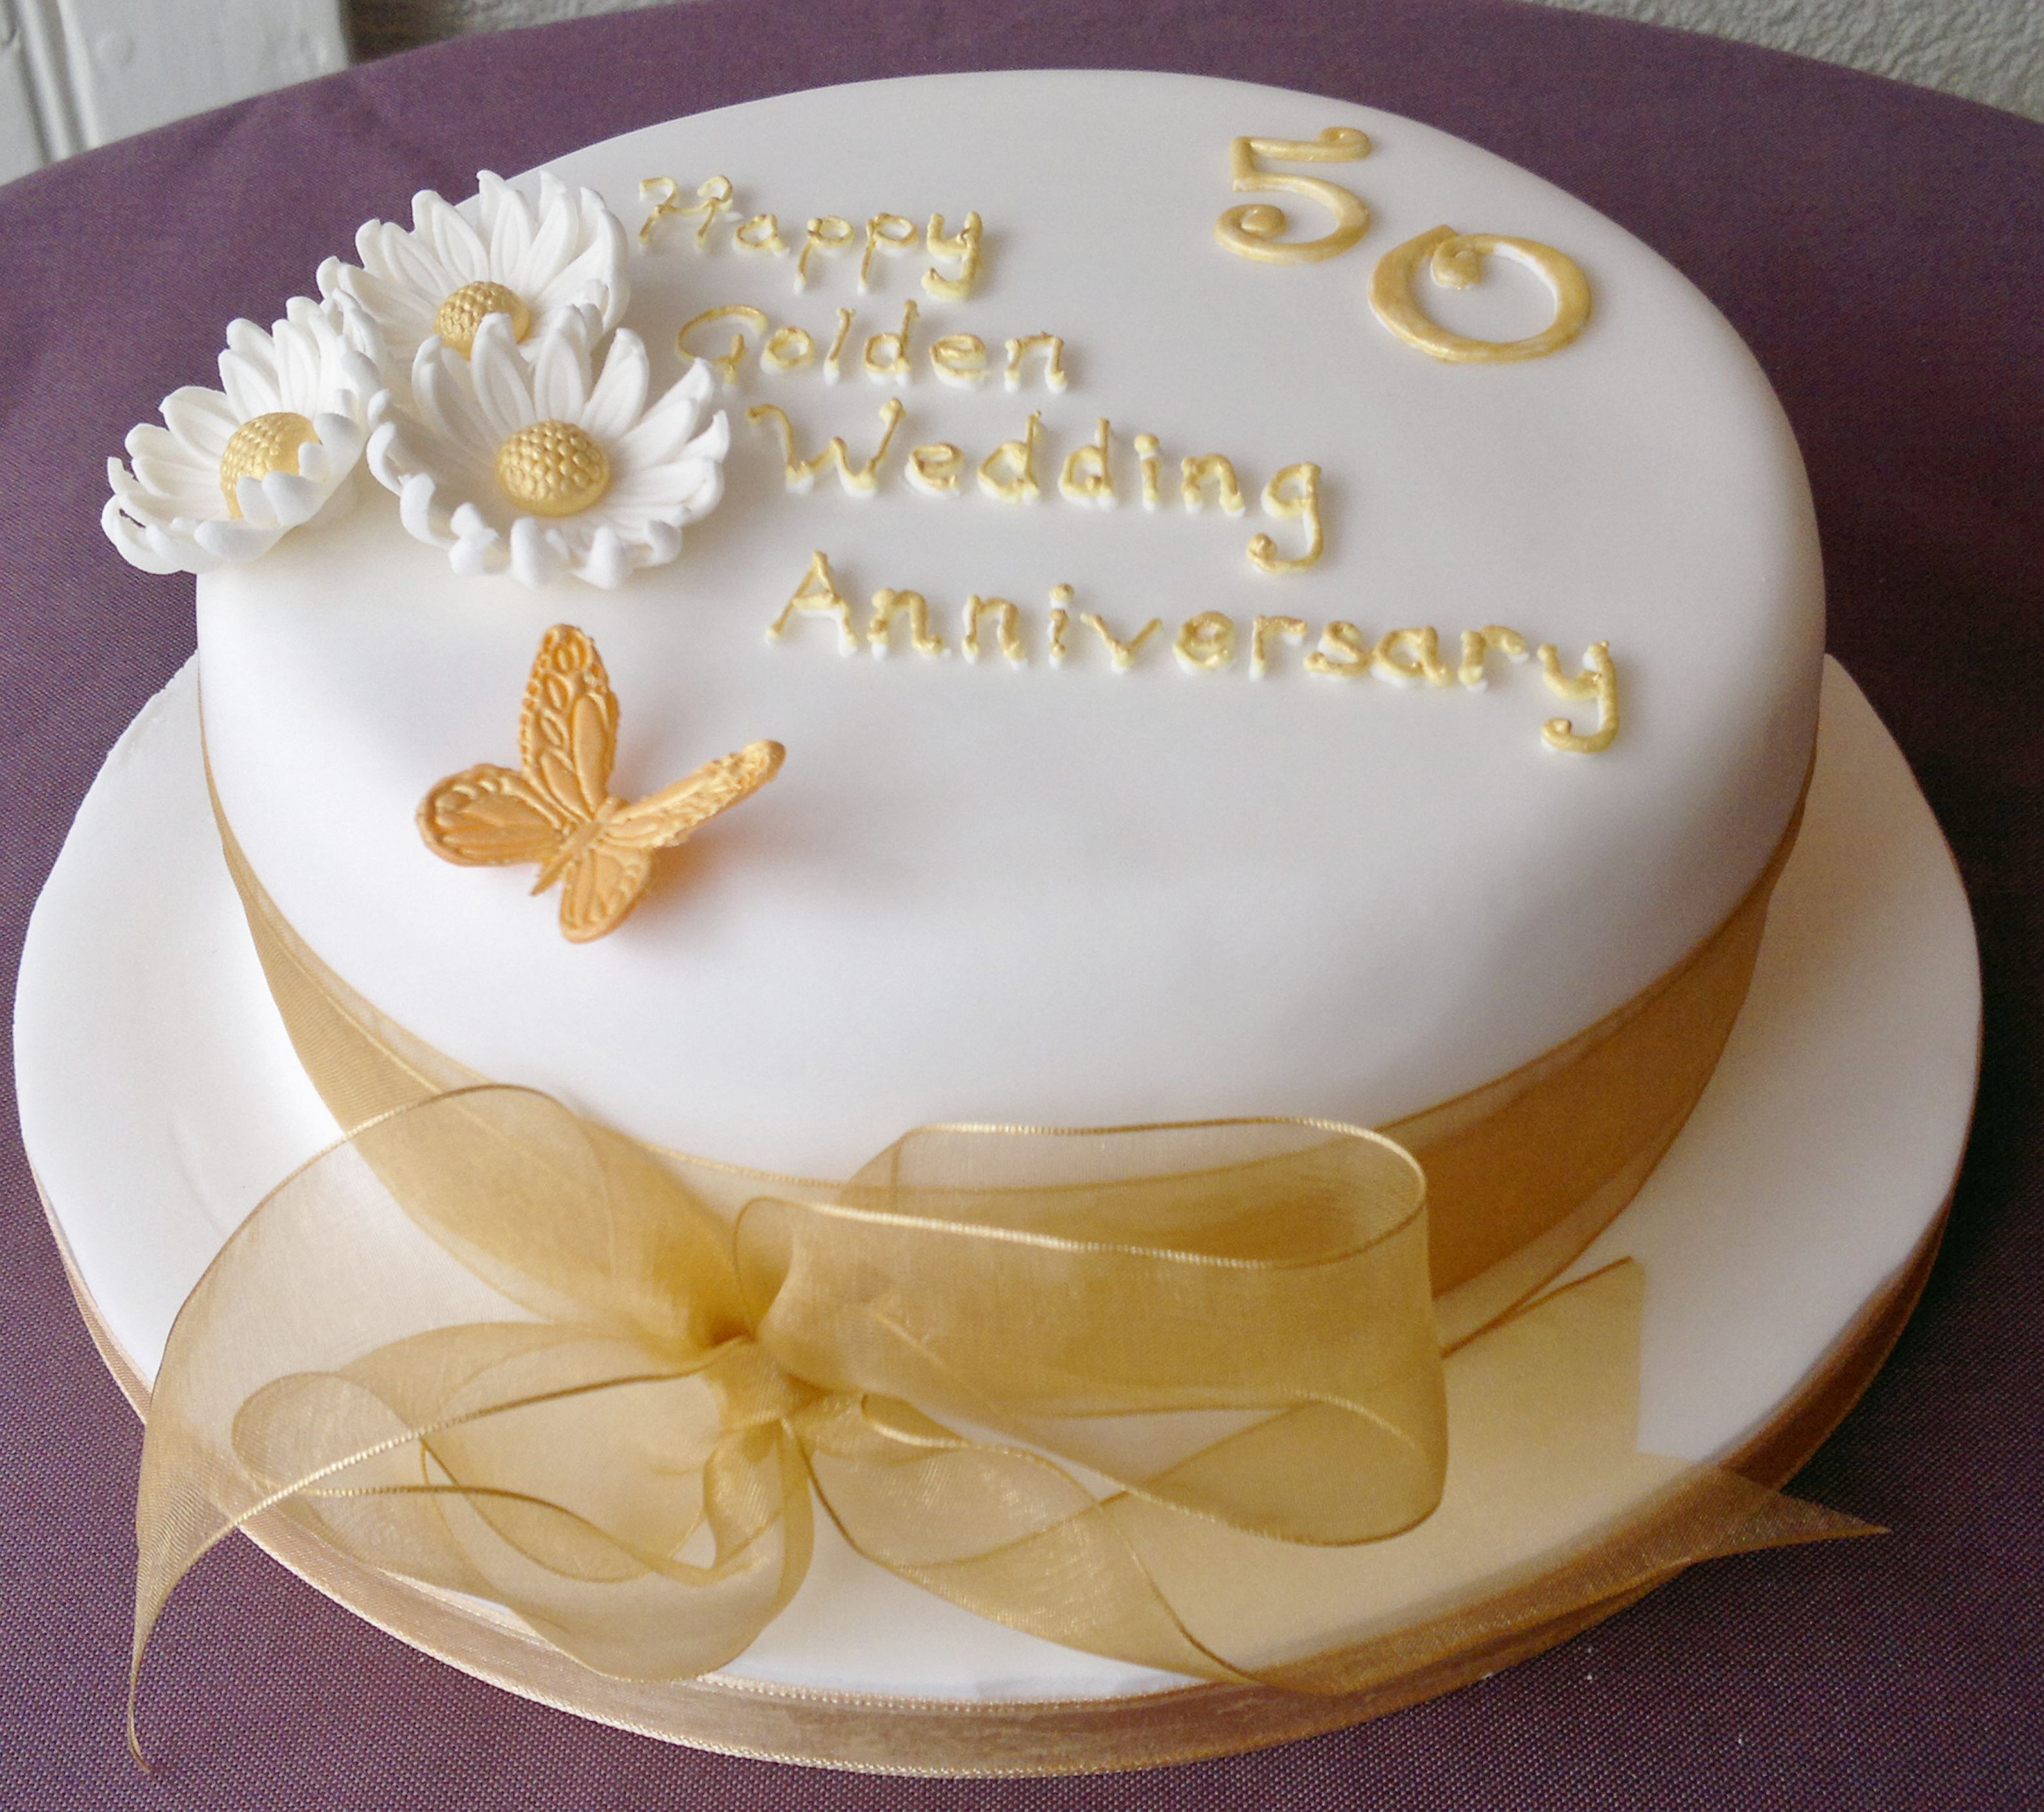 golden wedding anniversary cakes Google Search Golden